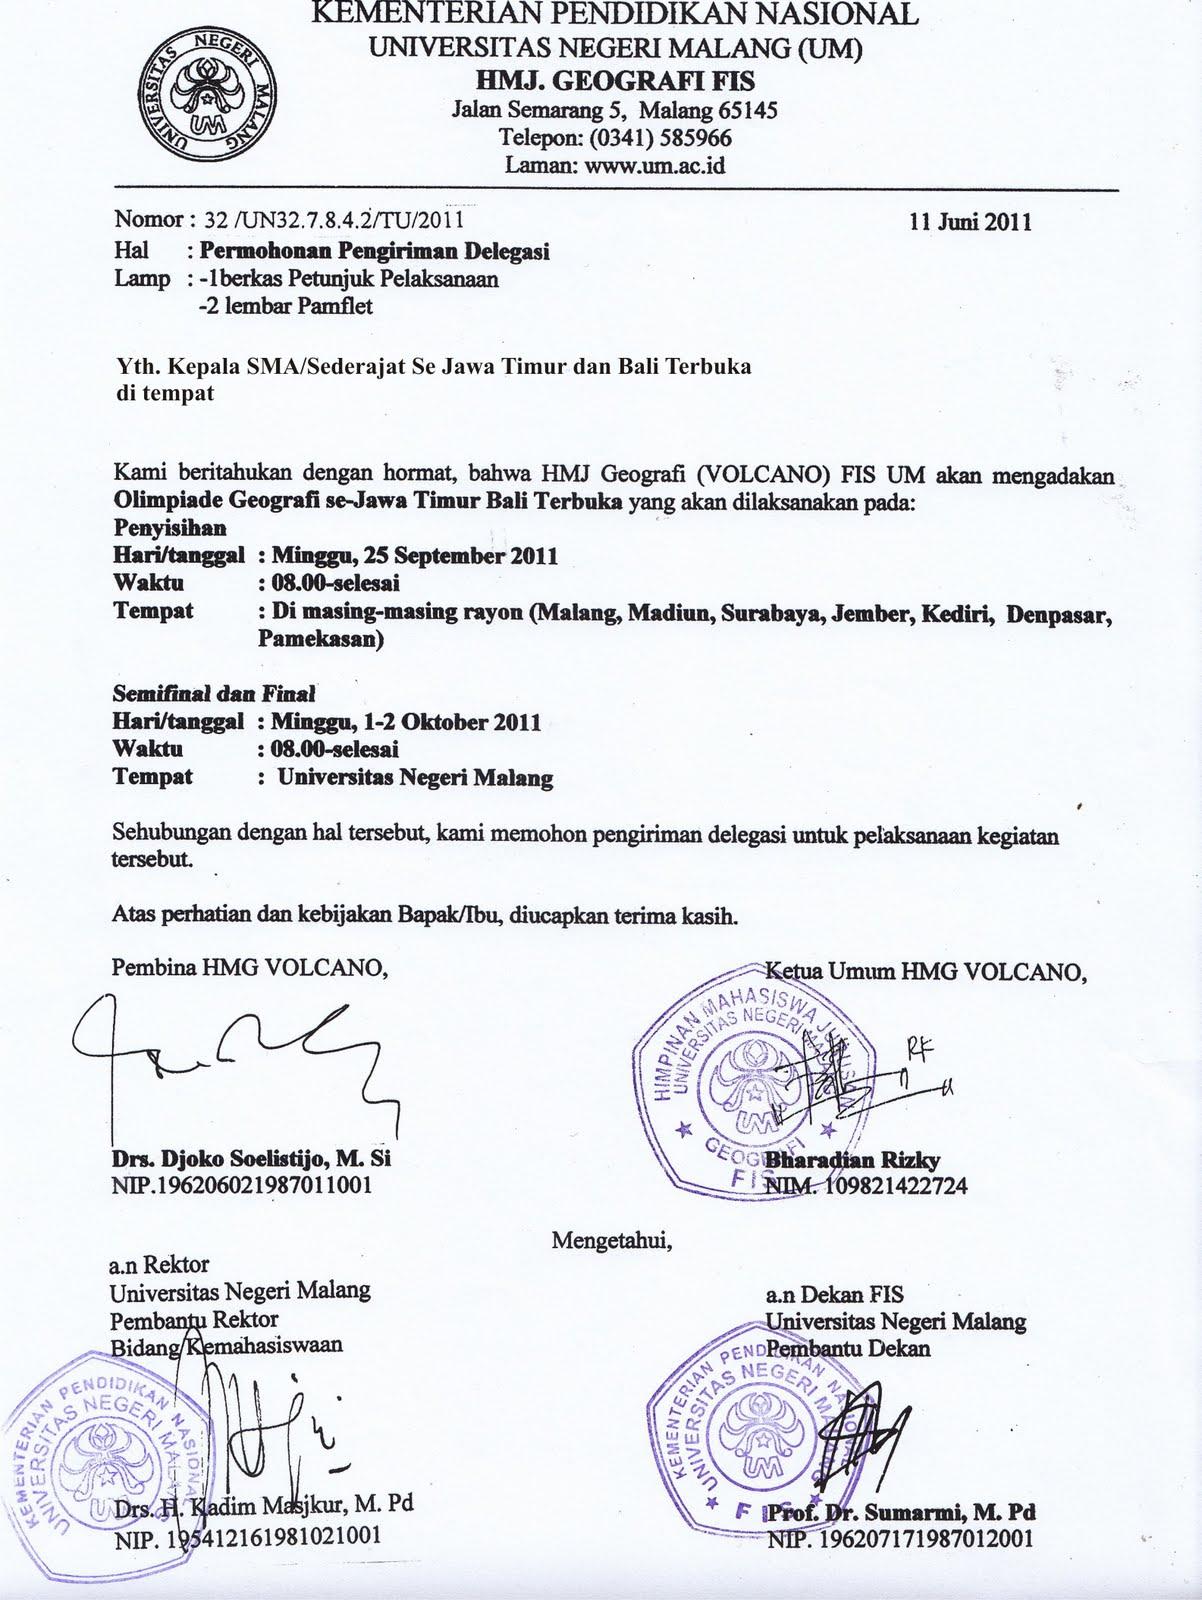 Surat Undangan Delegasi Olimpiade Geografi 2011